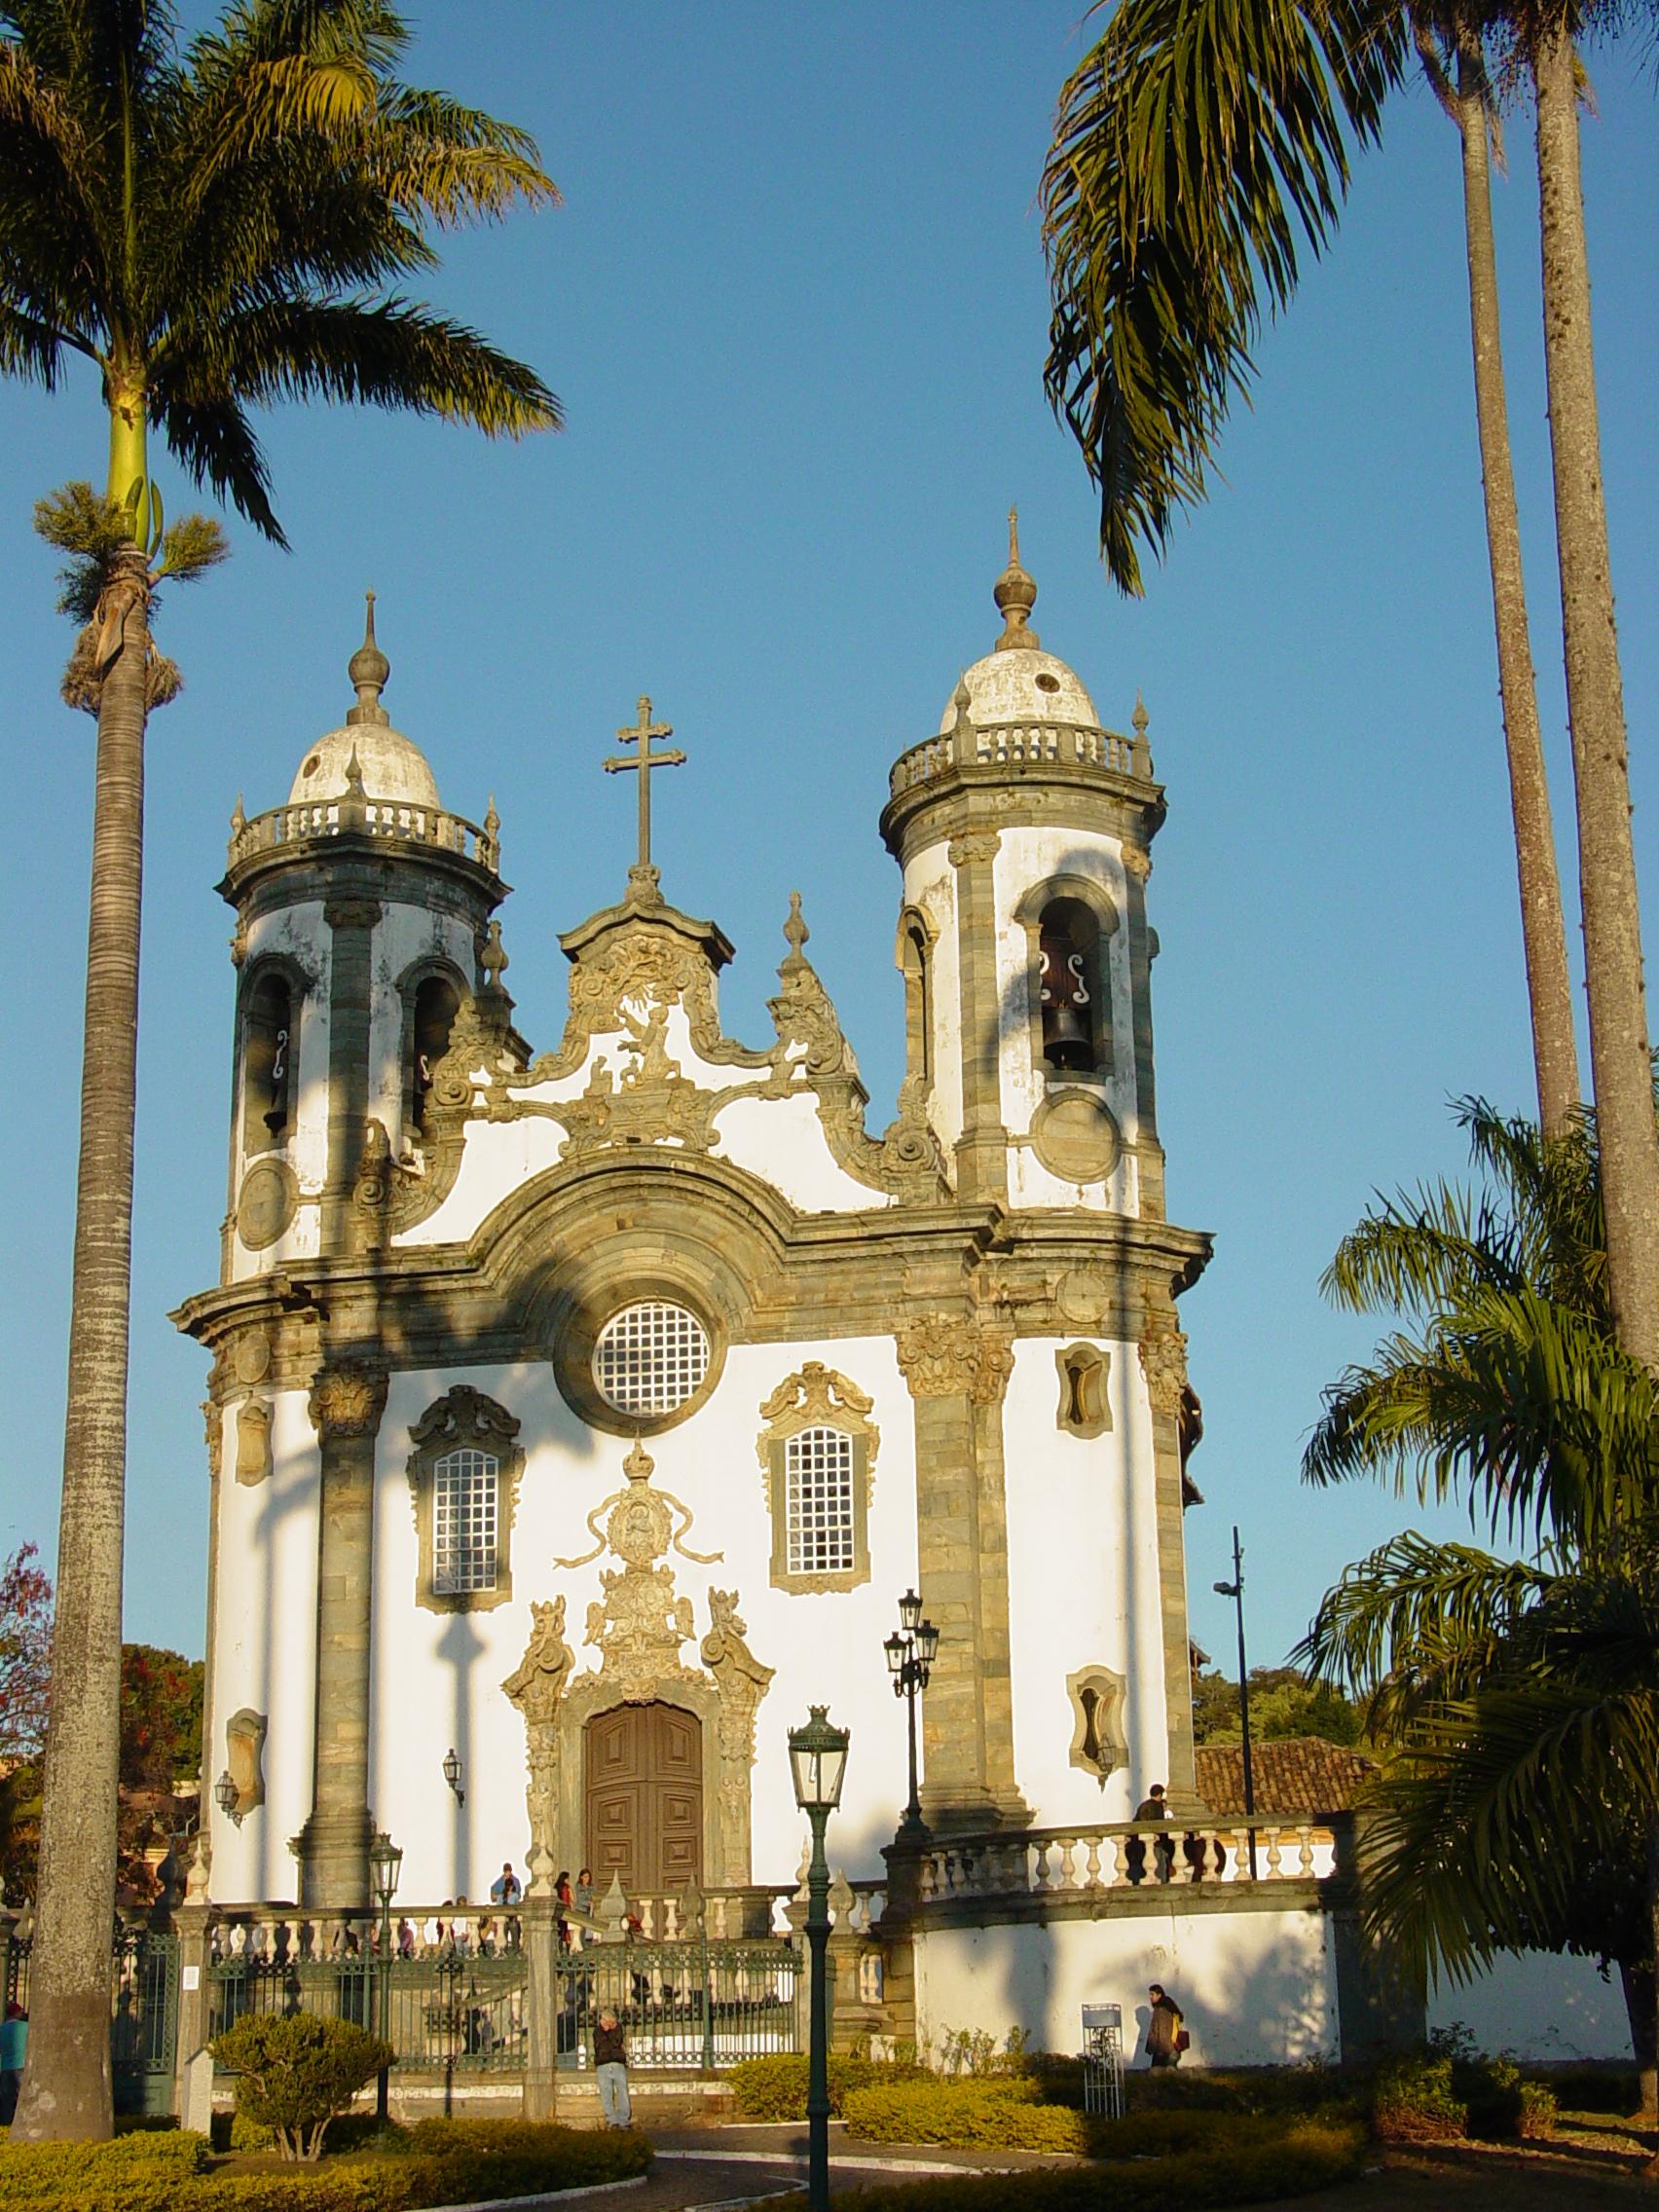 Berkas Igreja Sao Francisco de Assis Sao Joao del Rei Brazil 01 Sumber